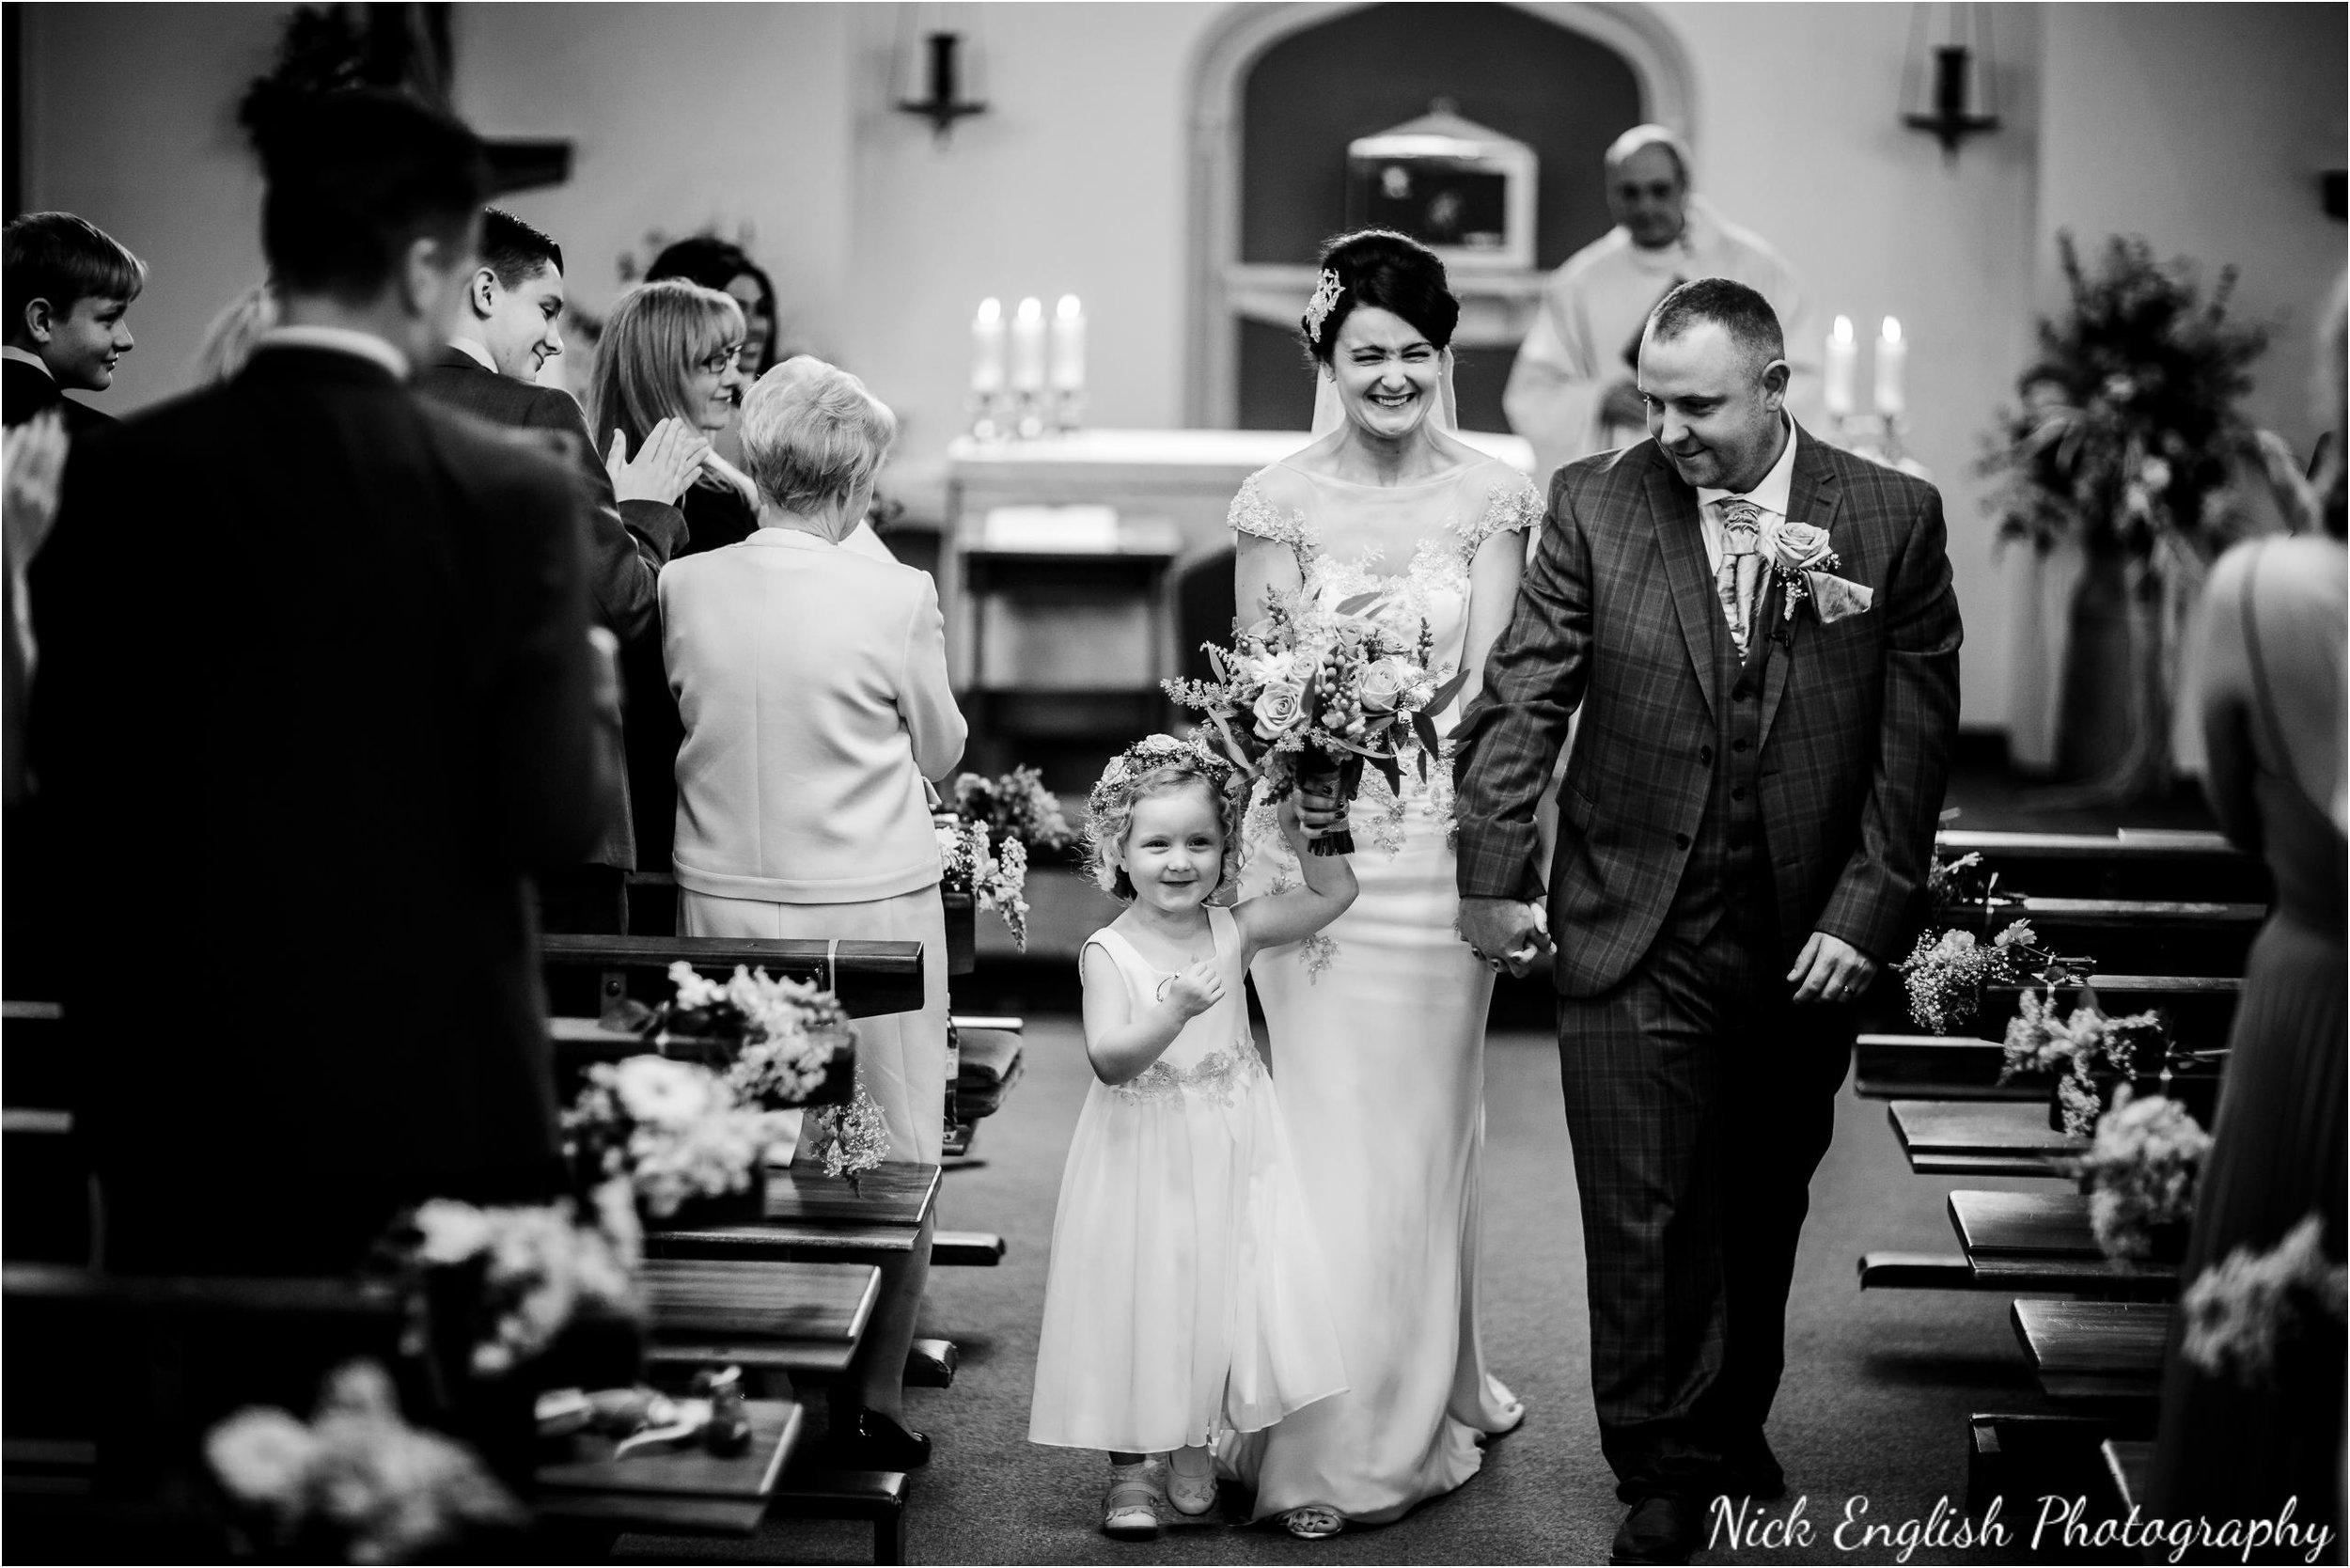 Stacey-Ash-Wedding-Photographs-Stanley-House-Preston-Lancashire-81.jpg